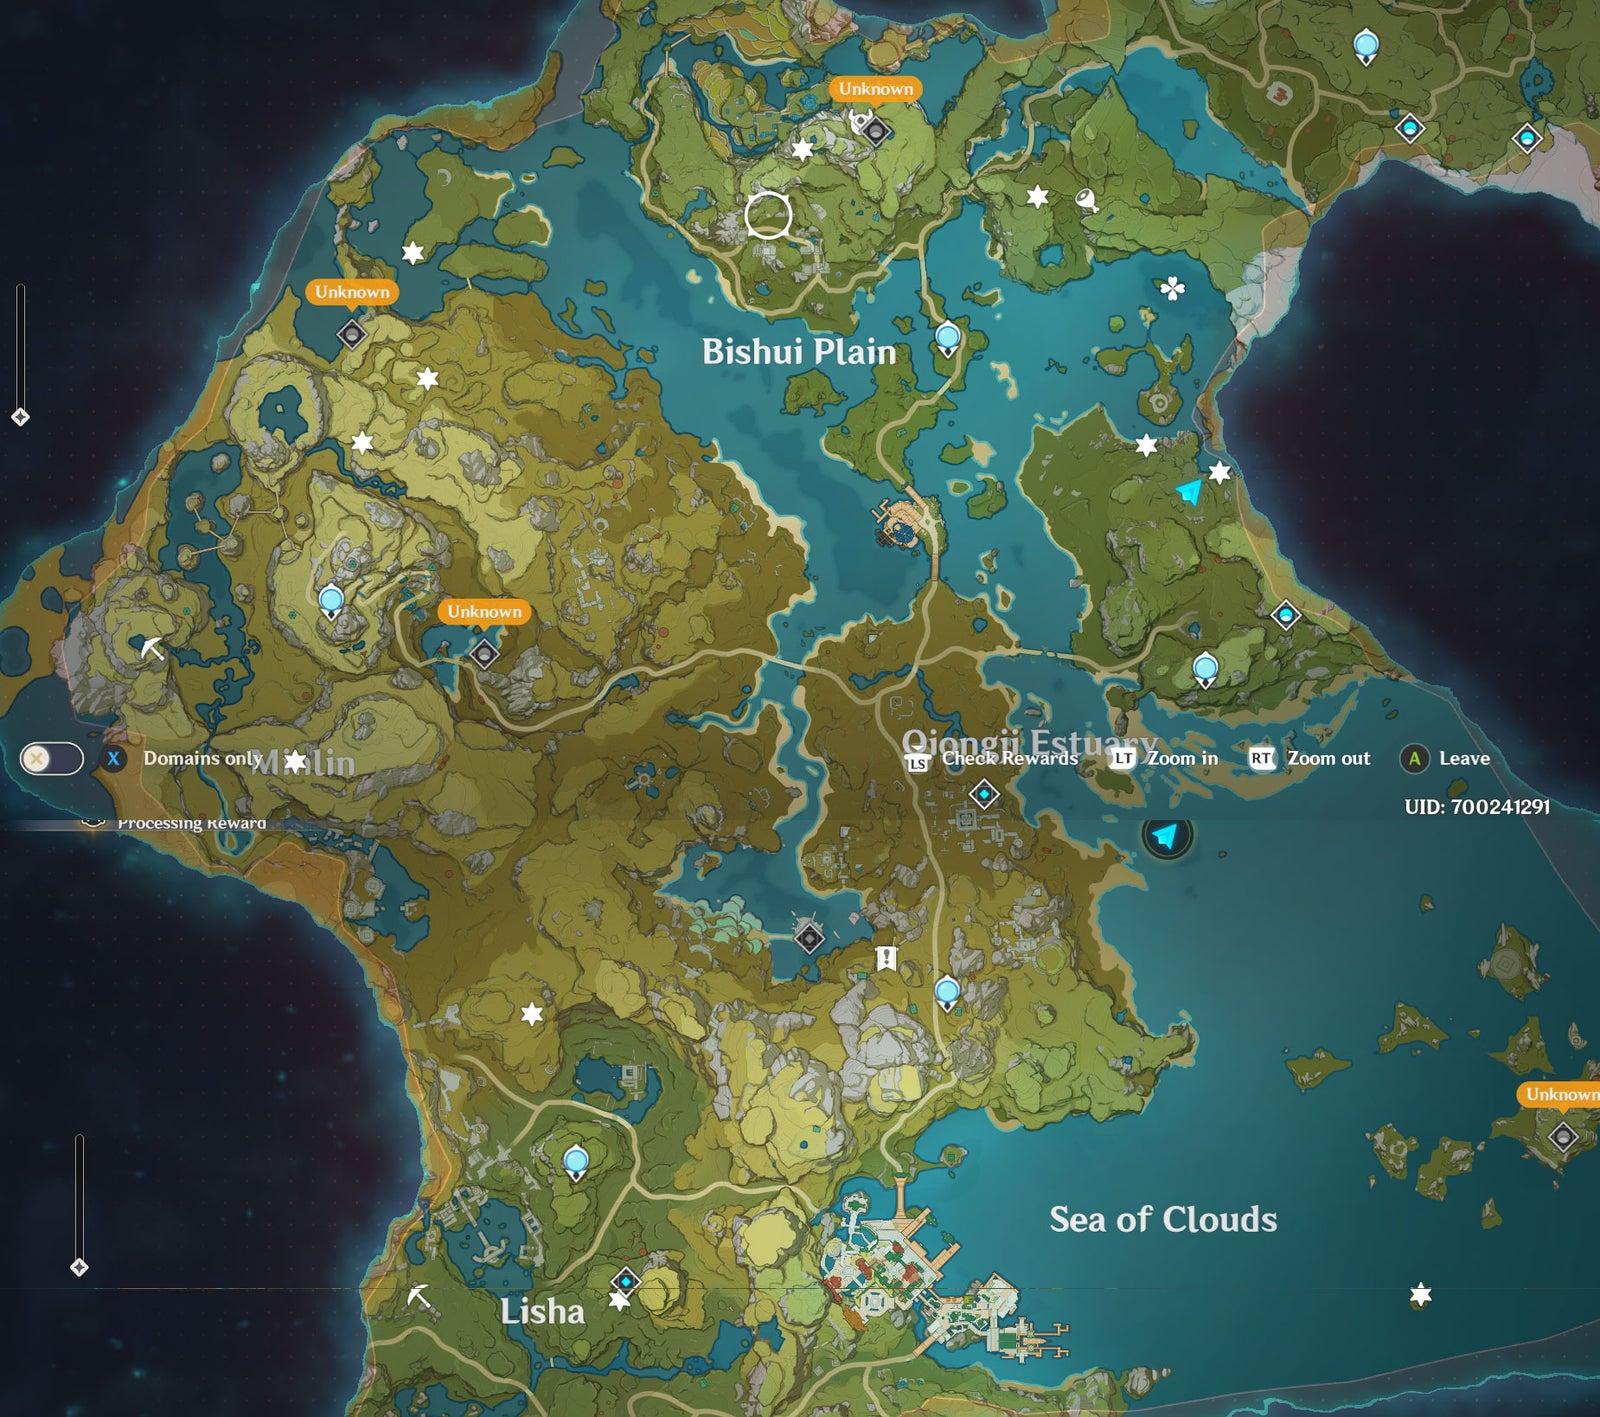 Cara Memakai Kunci Genshin Impact Shrine Of Depth Key Esportsku